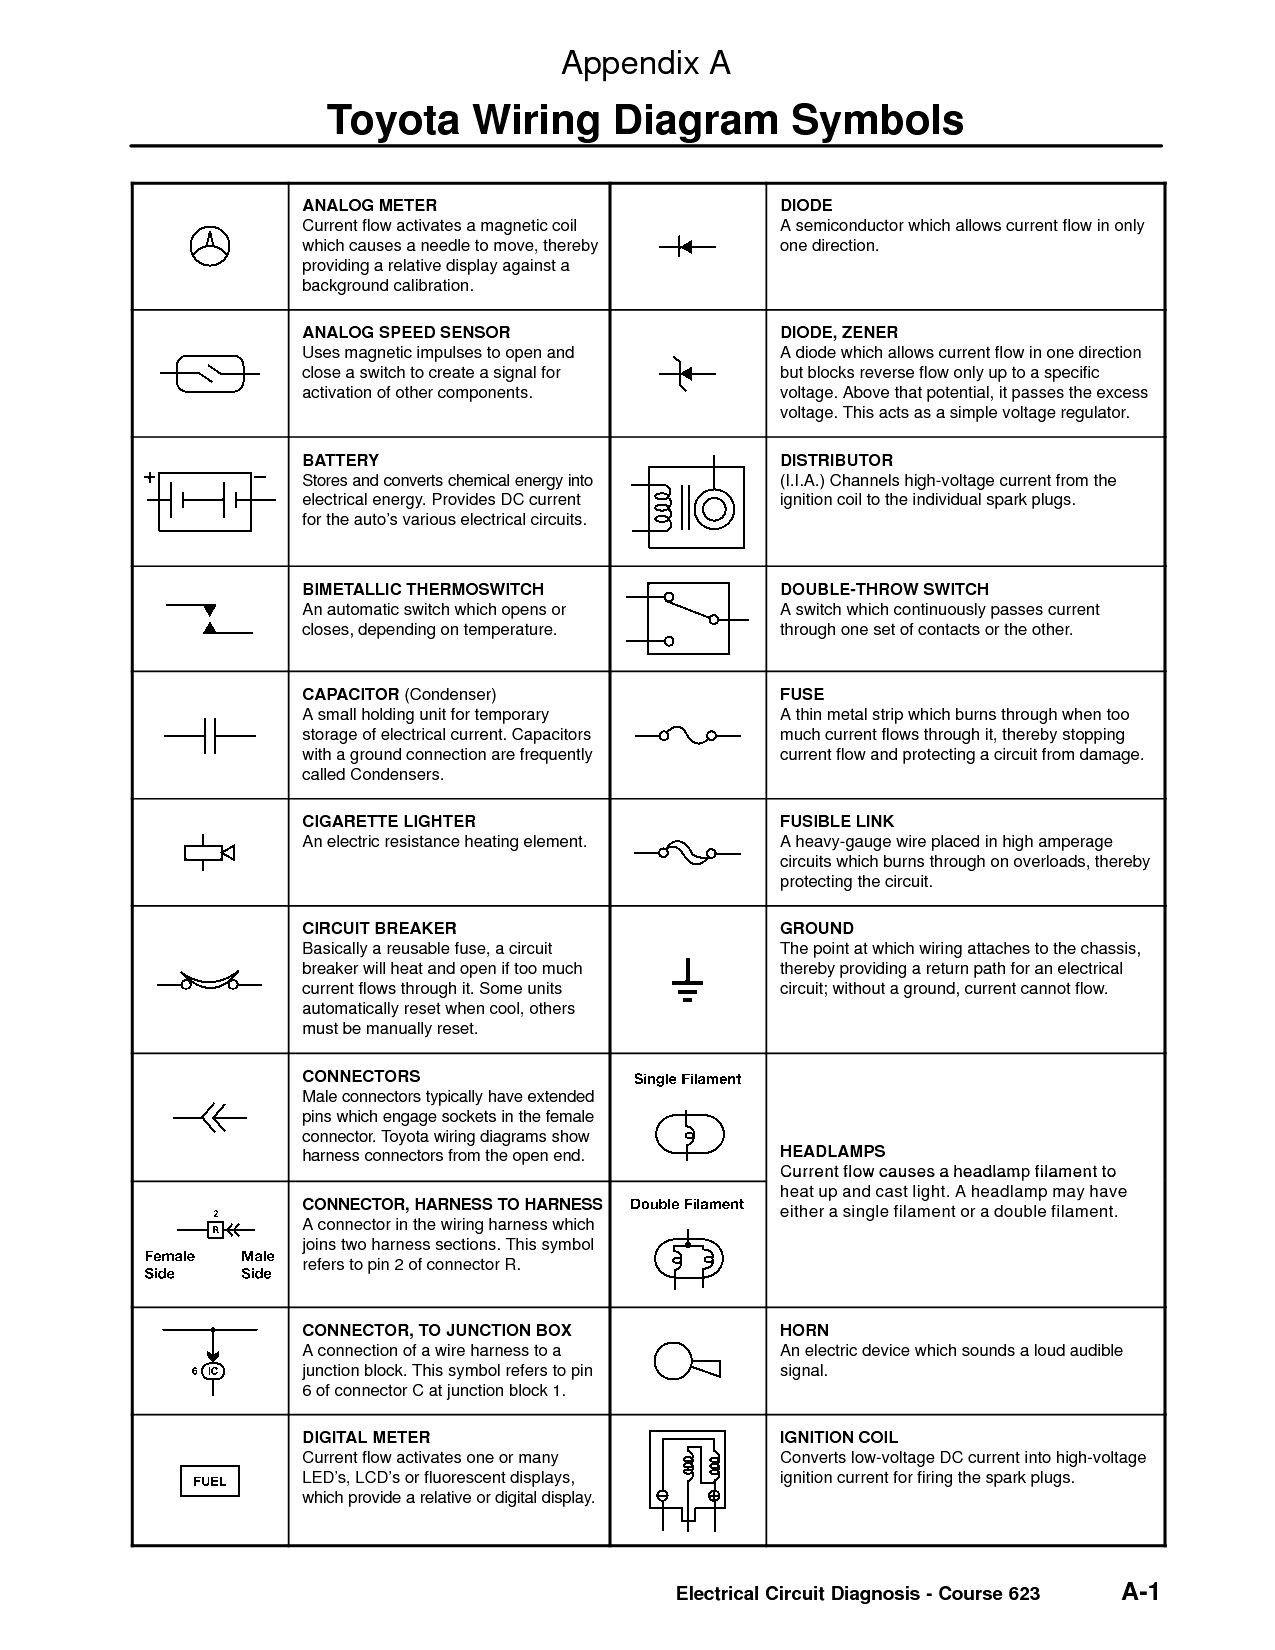 New Wiring Diagram Key Diagram Wiringdiagram Diagramming Diagramm Visuals Visualisation Electrical Symbols Electrical Wiring Diagram Electrical Diagram